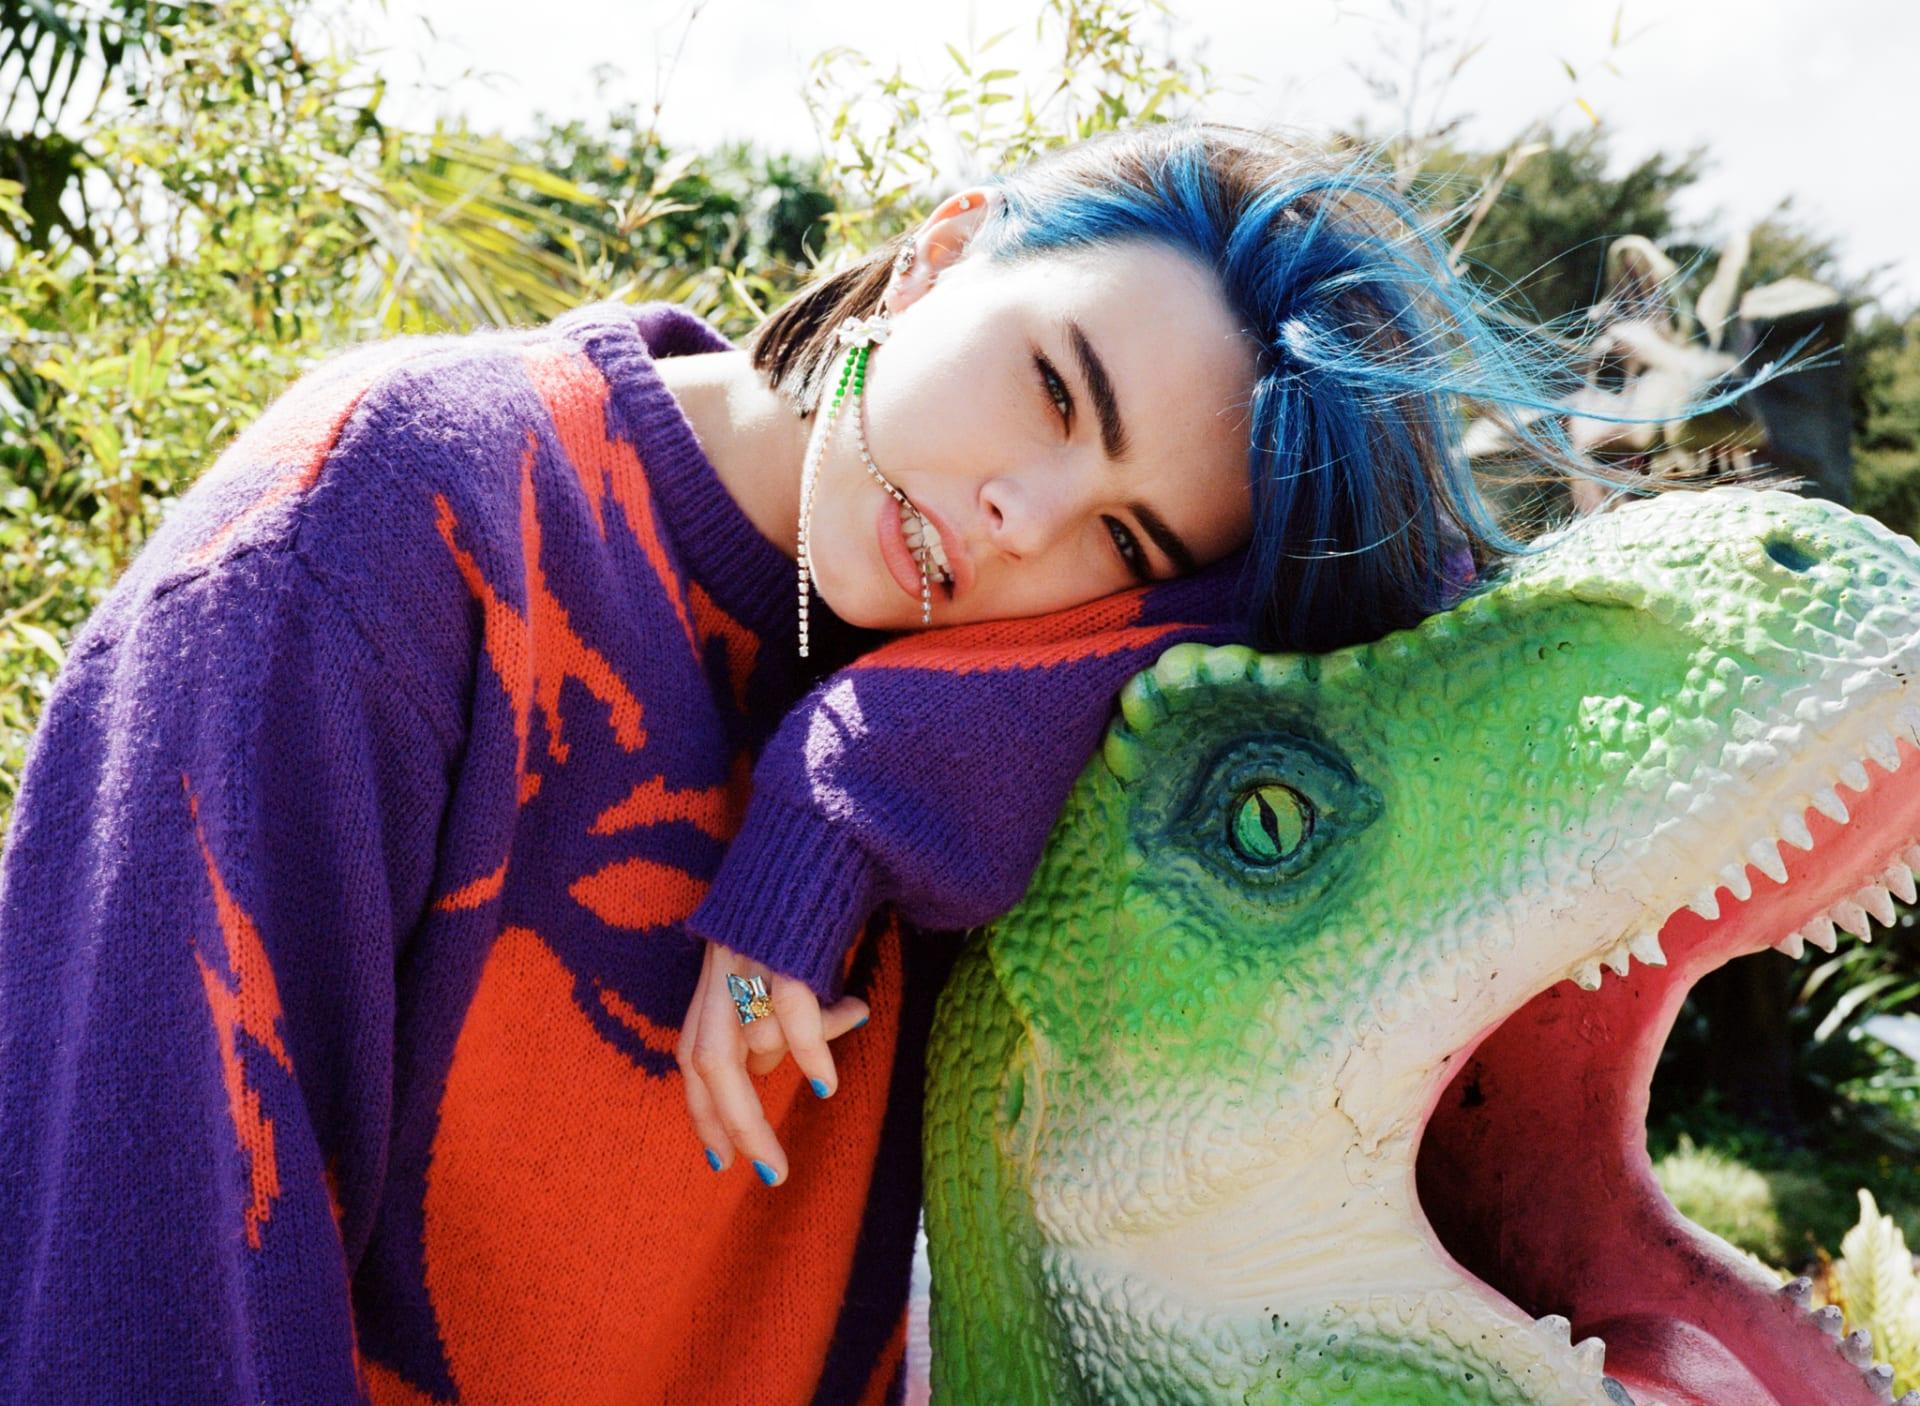 Meet Benee A Kiwi Pop Star In The Making Complex